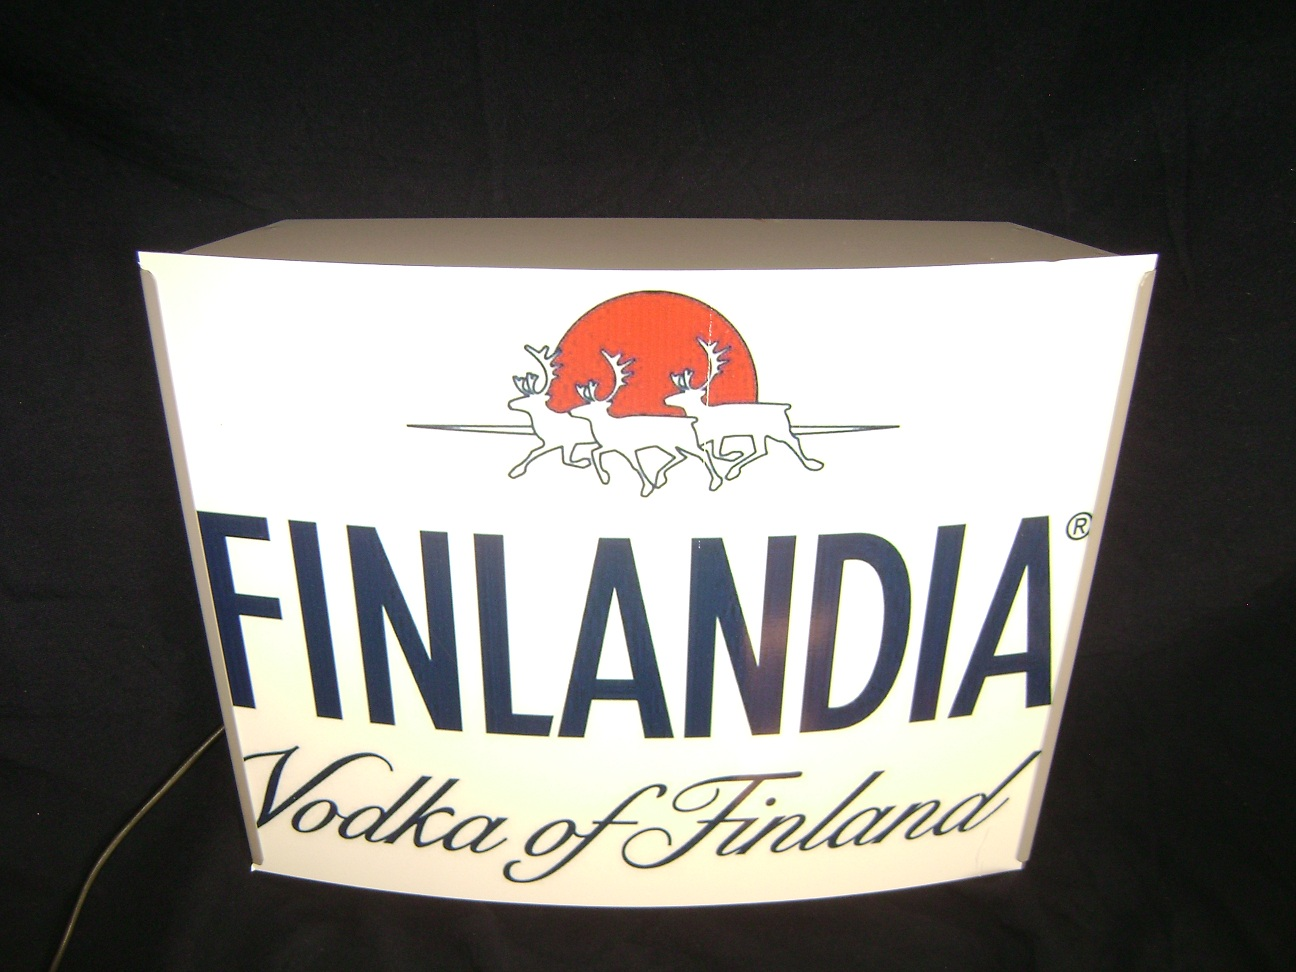 Reklama_svetleca_Finlandia_vodka_1.jpg